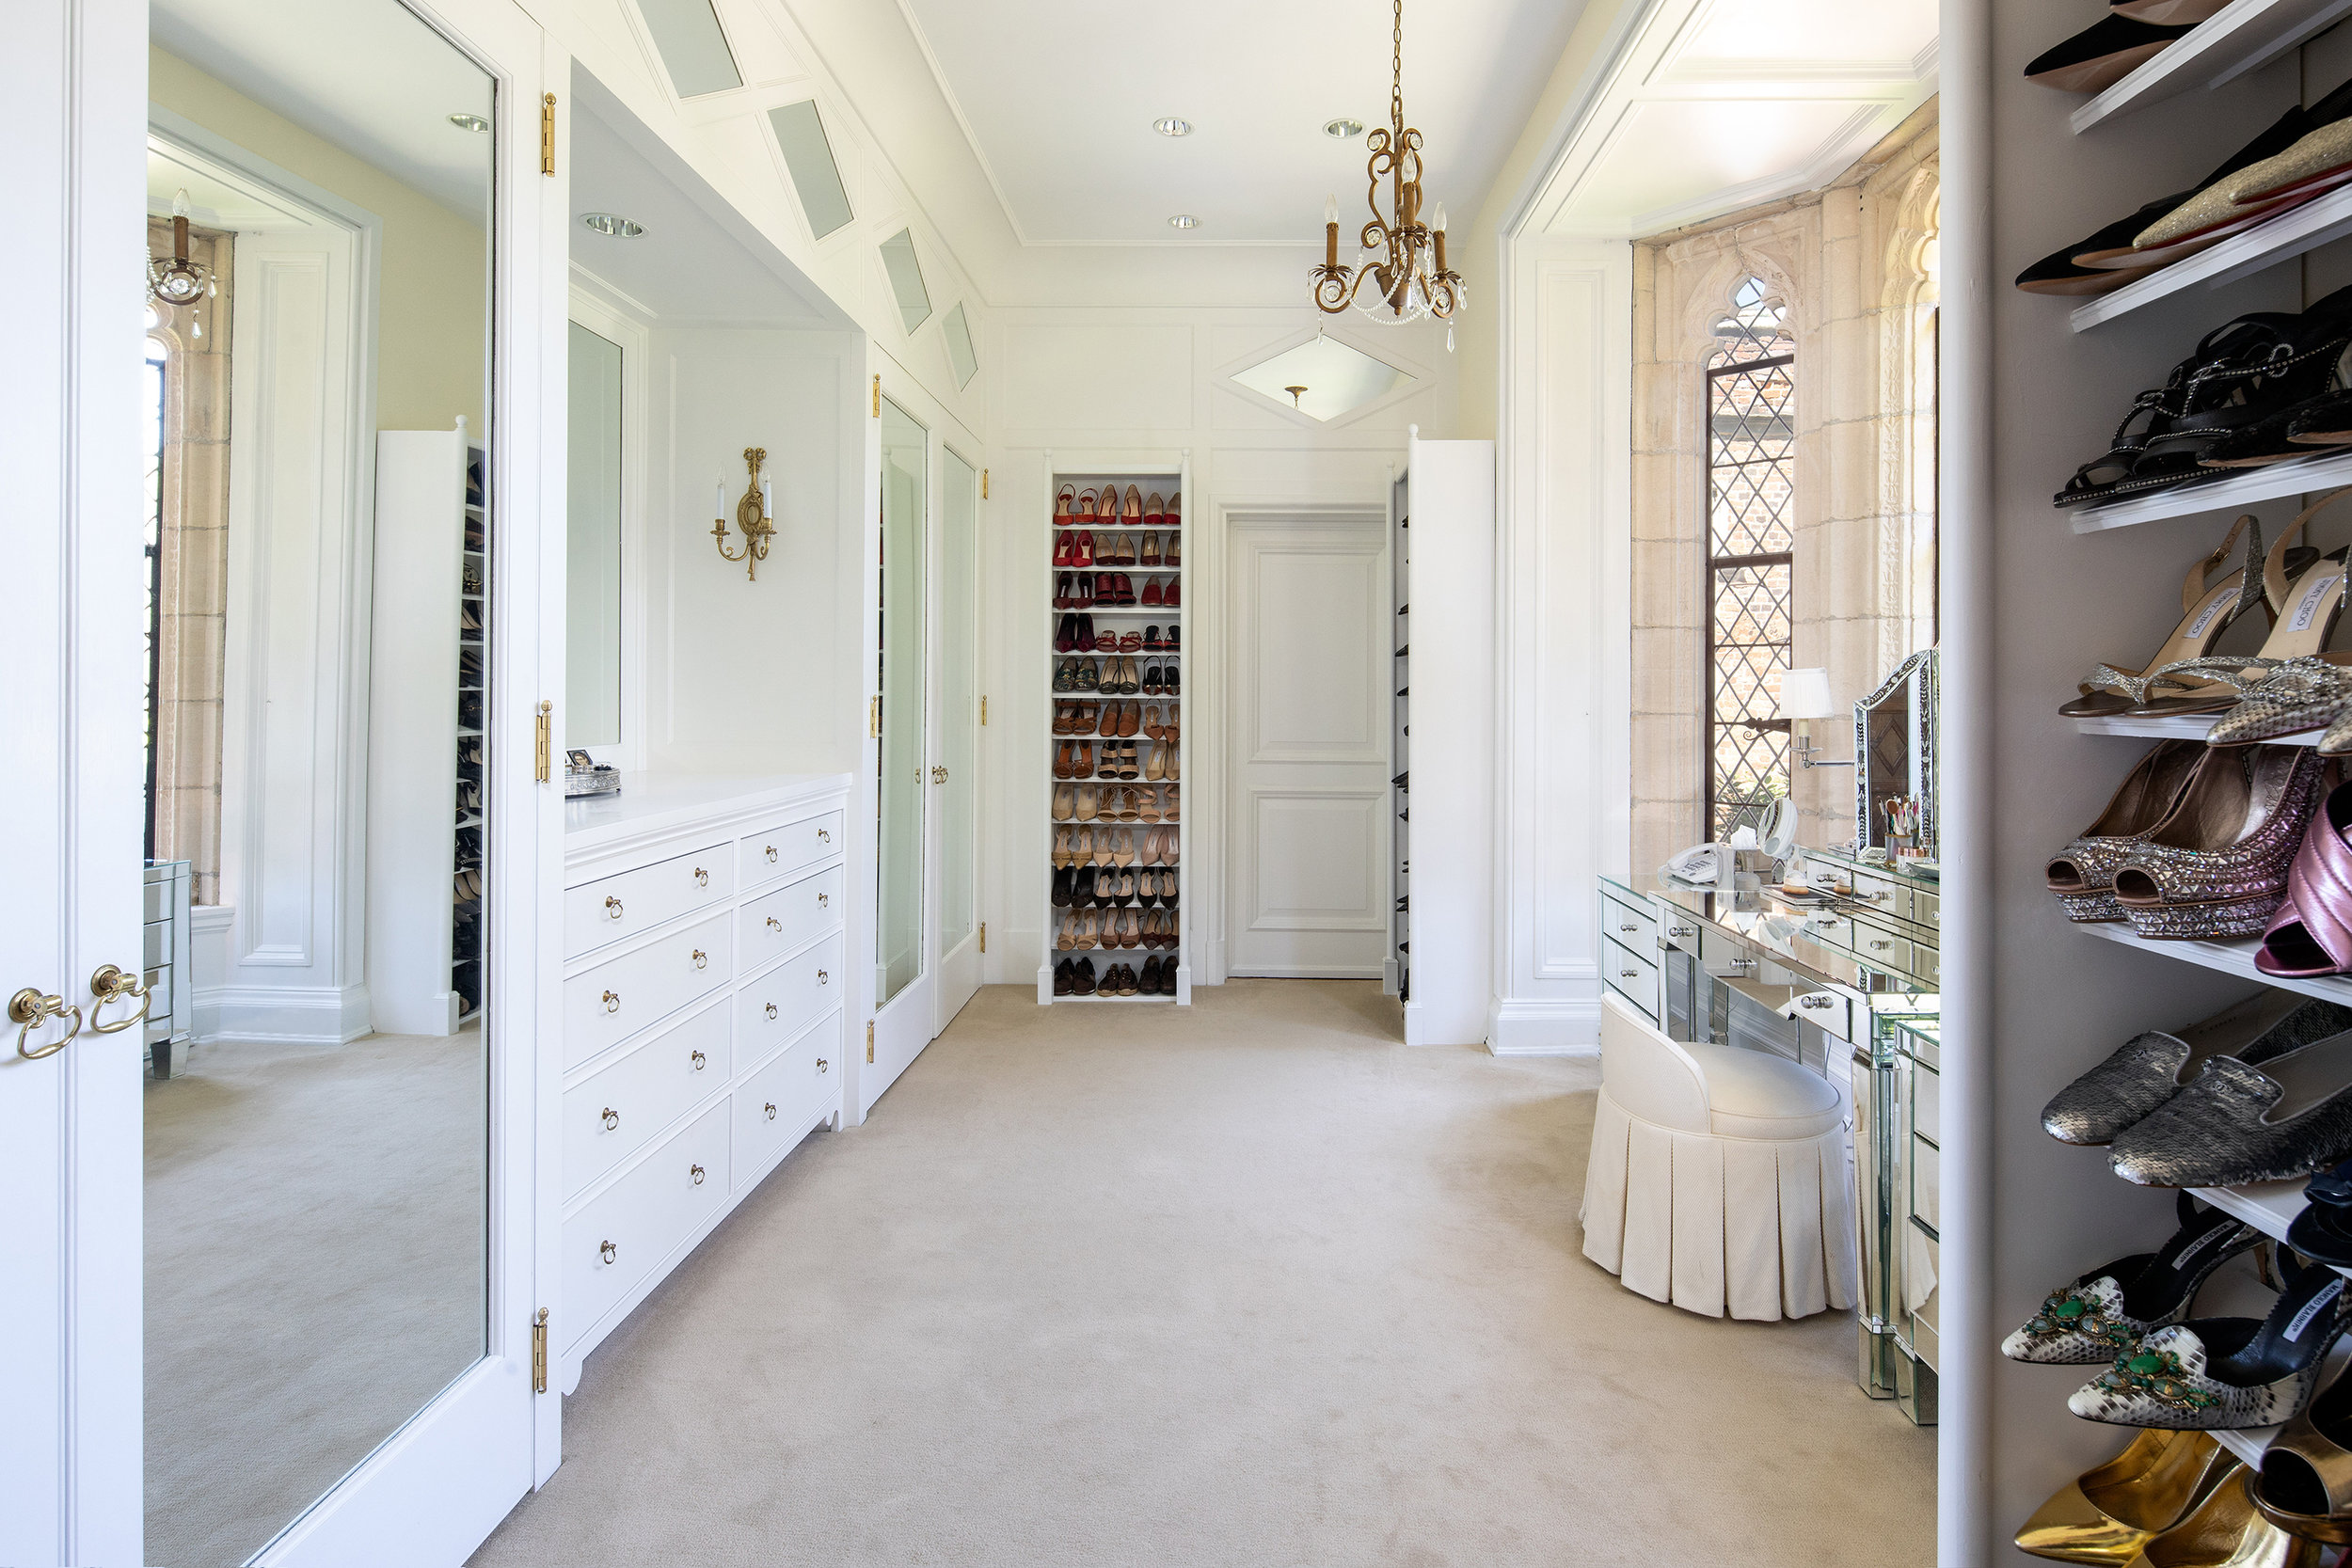 Copy of Master Bedroom Dressing Room